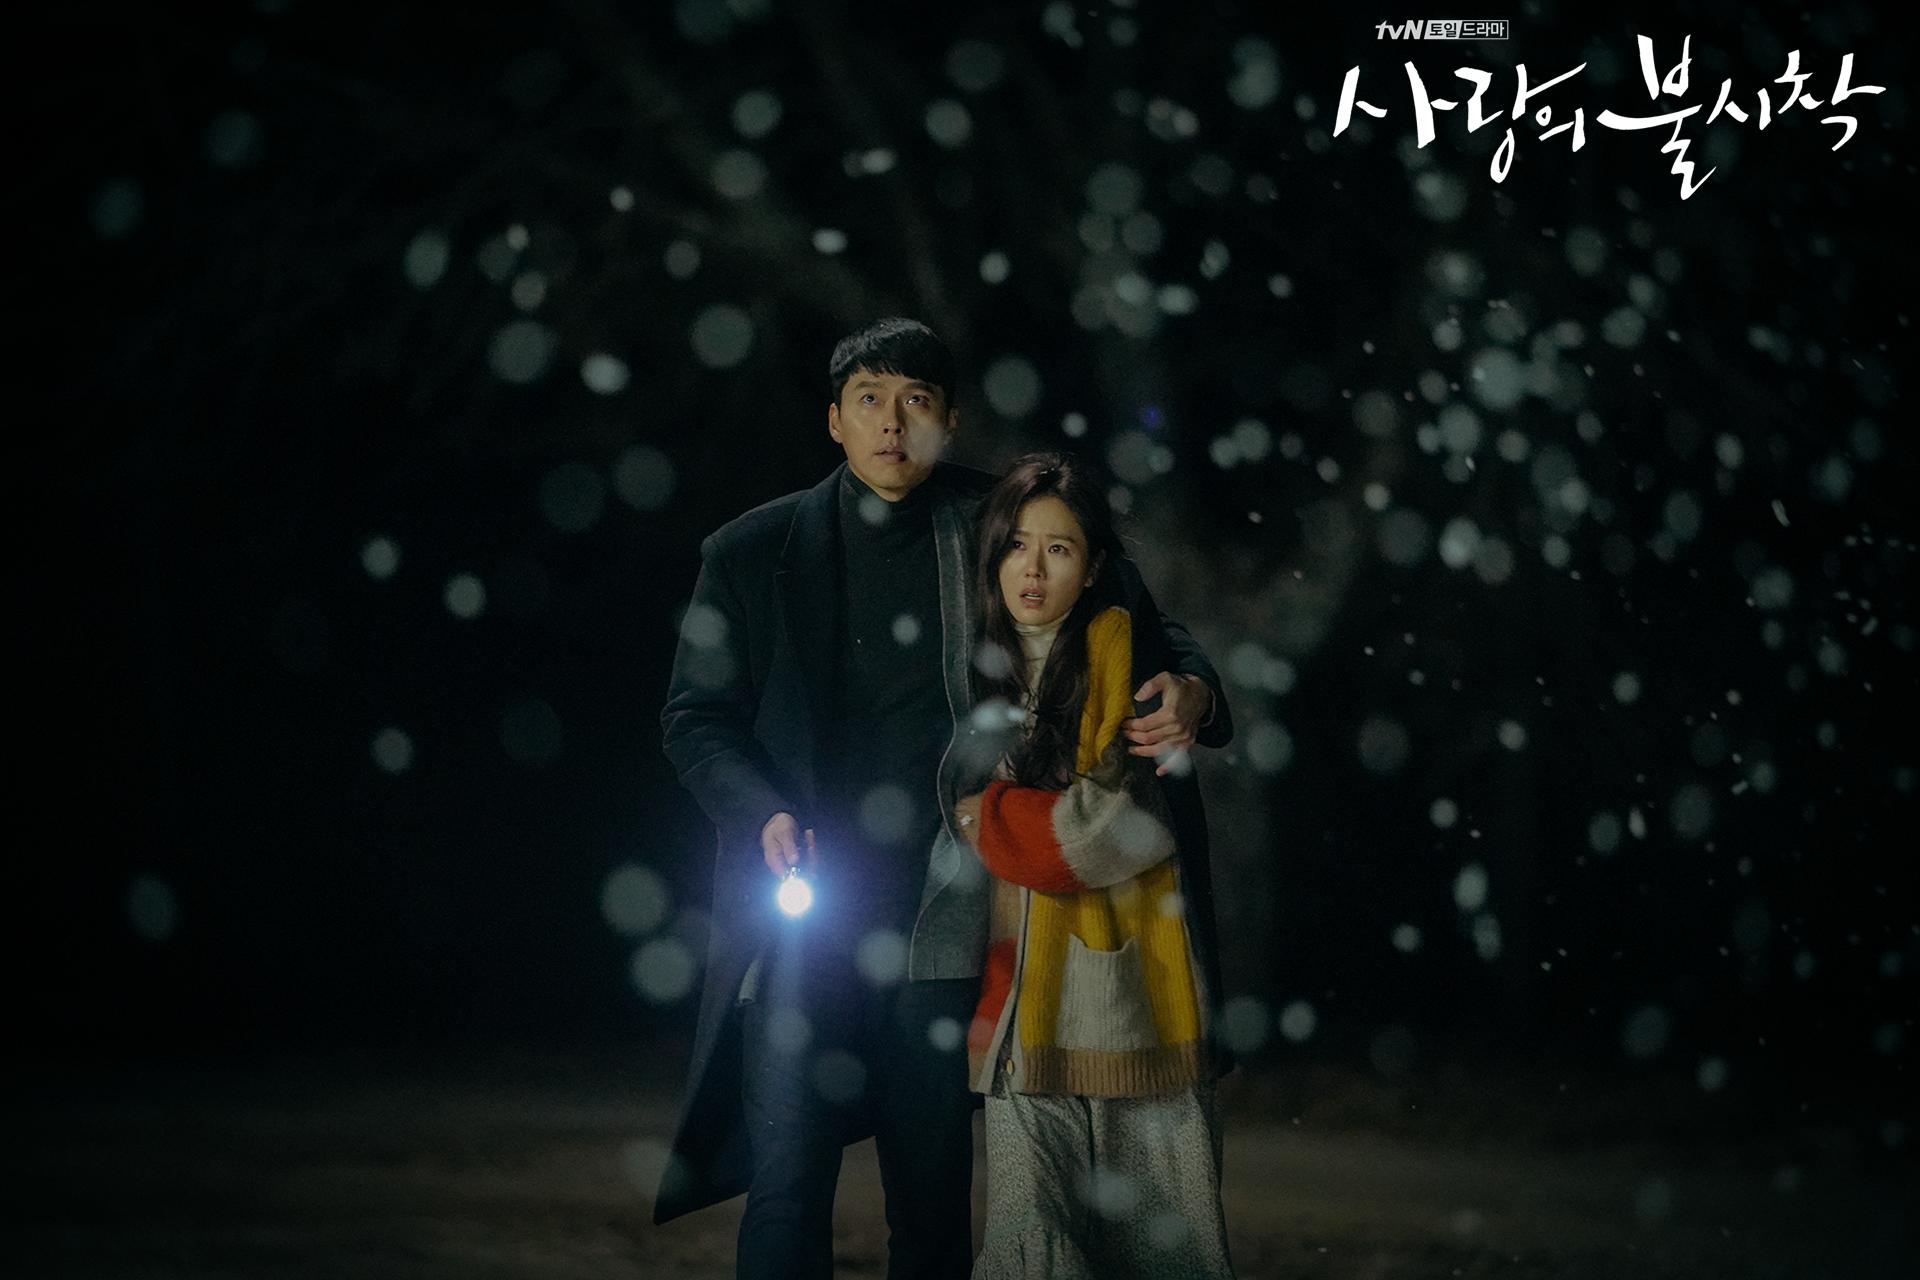 Crash Landing on You Captain Ri Jeong-hyeok and Yoon Se-ri walking in the snow episode 8